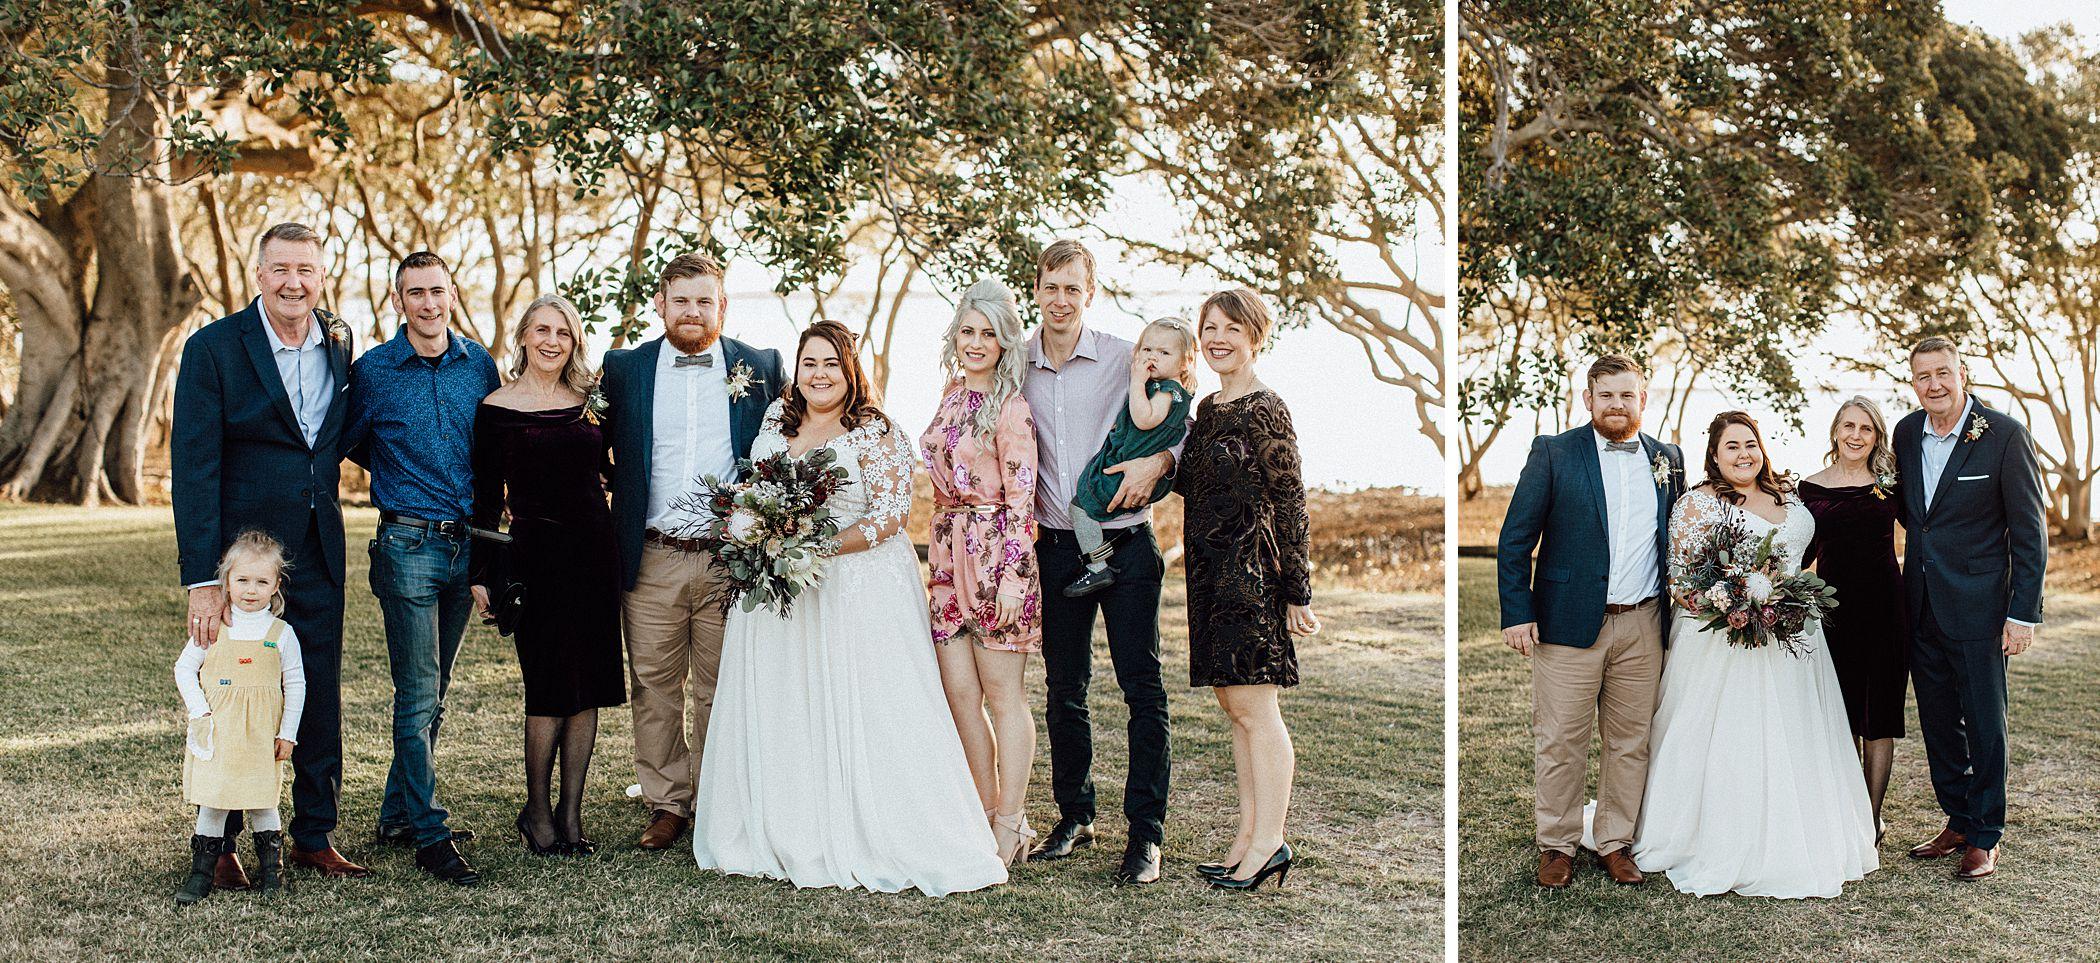 lauren-anne-photography-newcastle-hunter-valley-wedding-photographer_1200.jpg